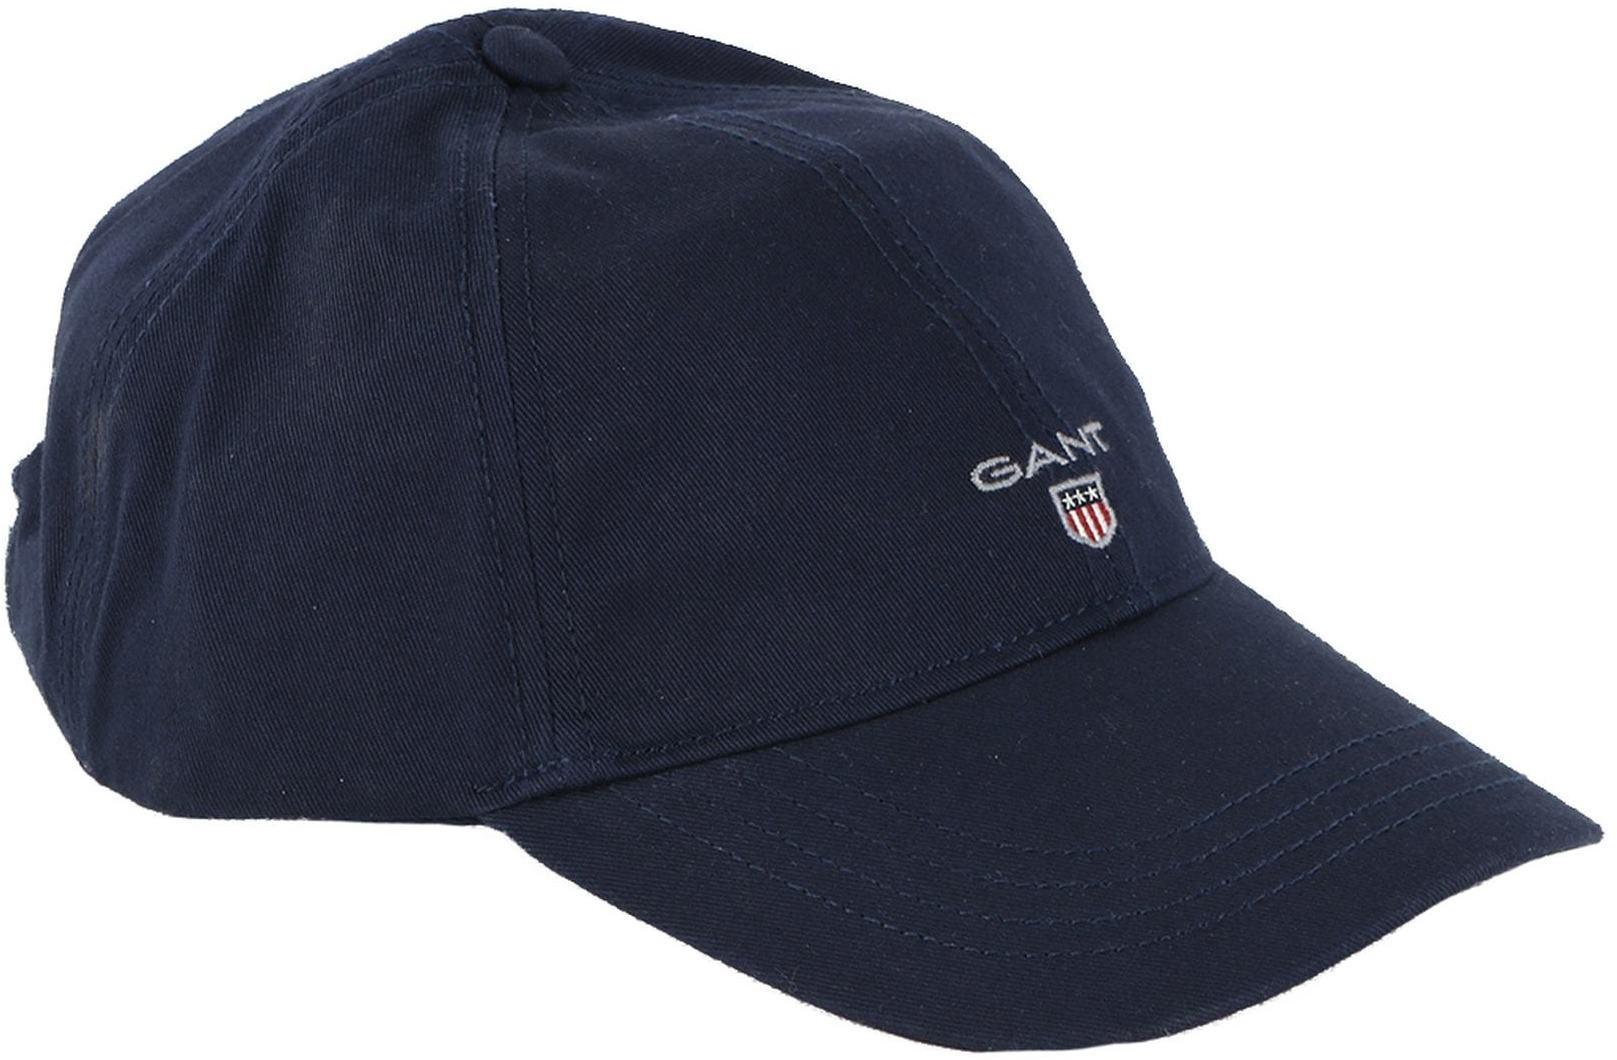 59ae0373a2f Gant Cap Navy order online